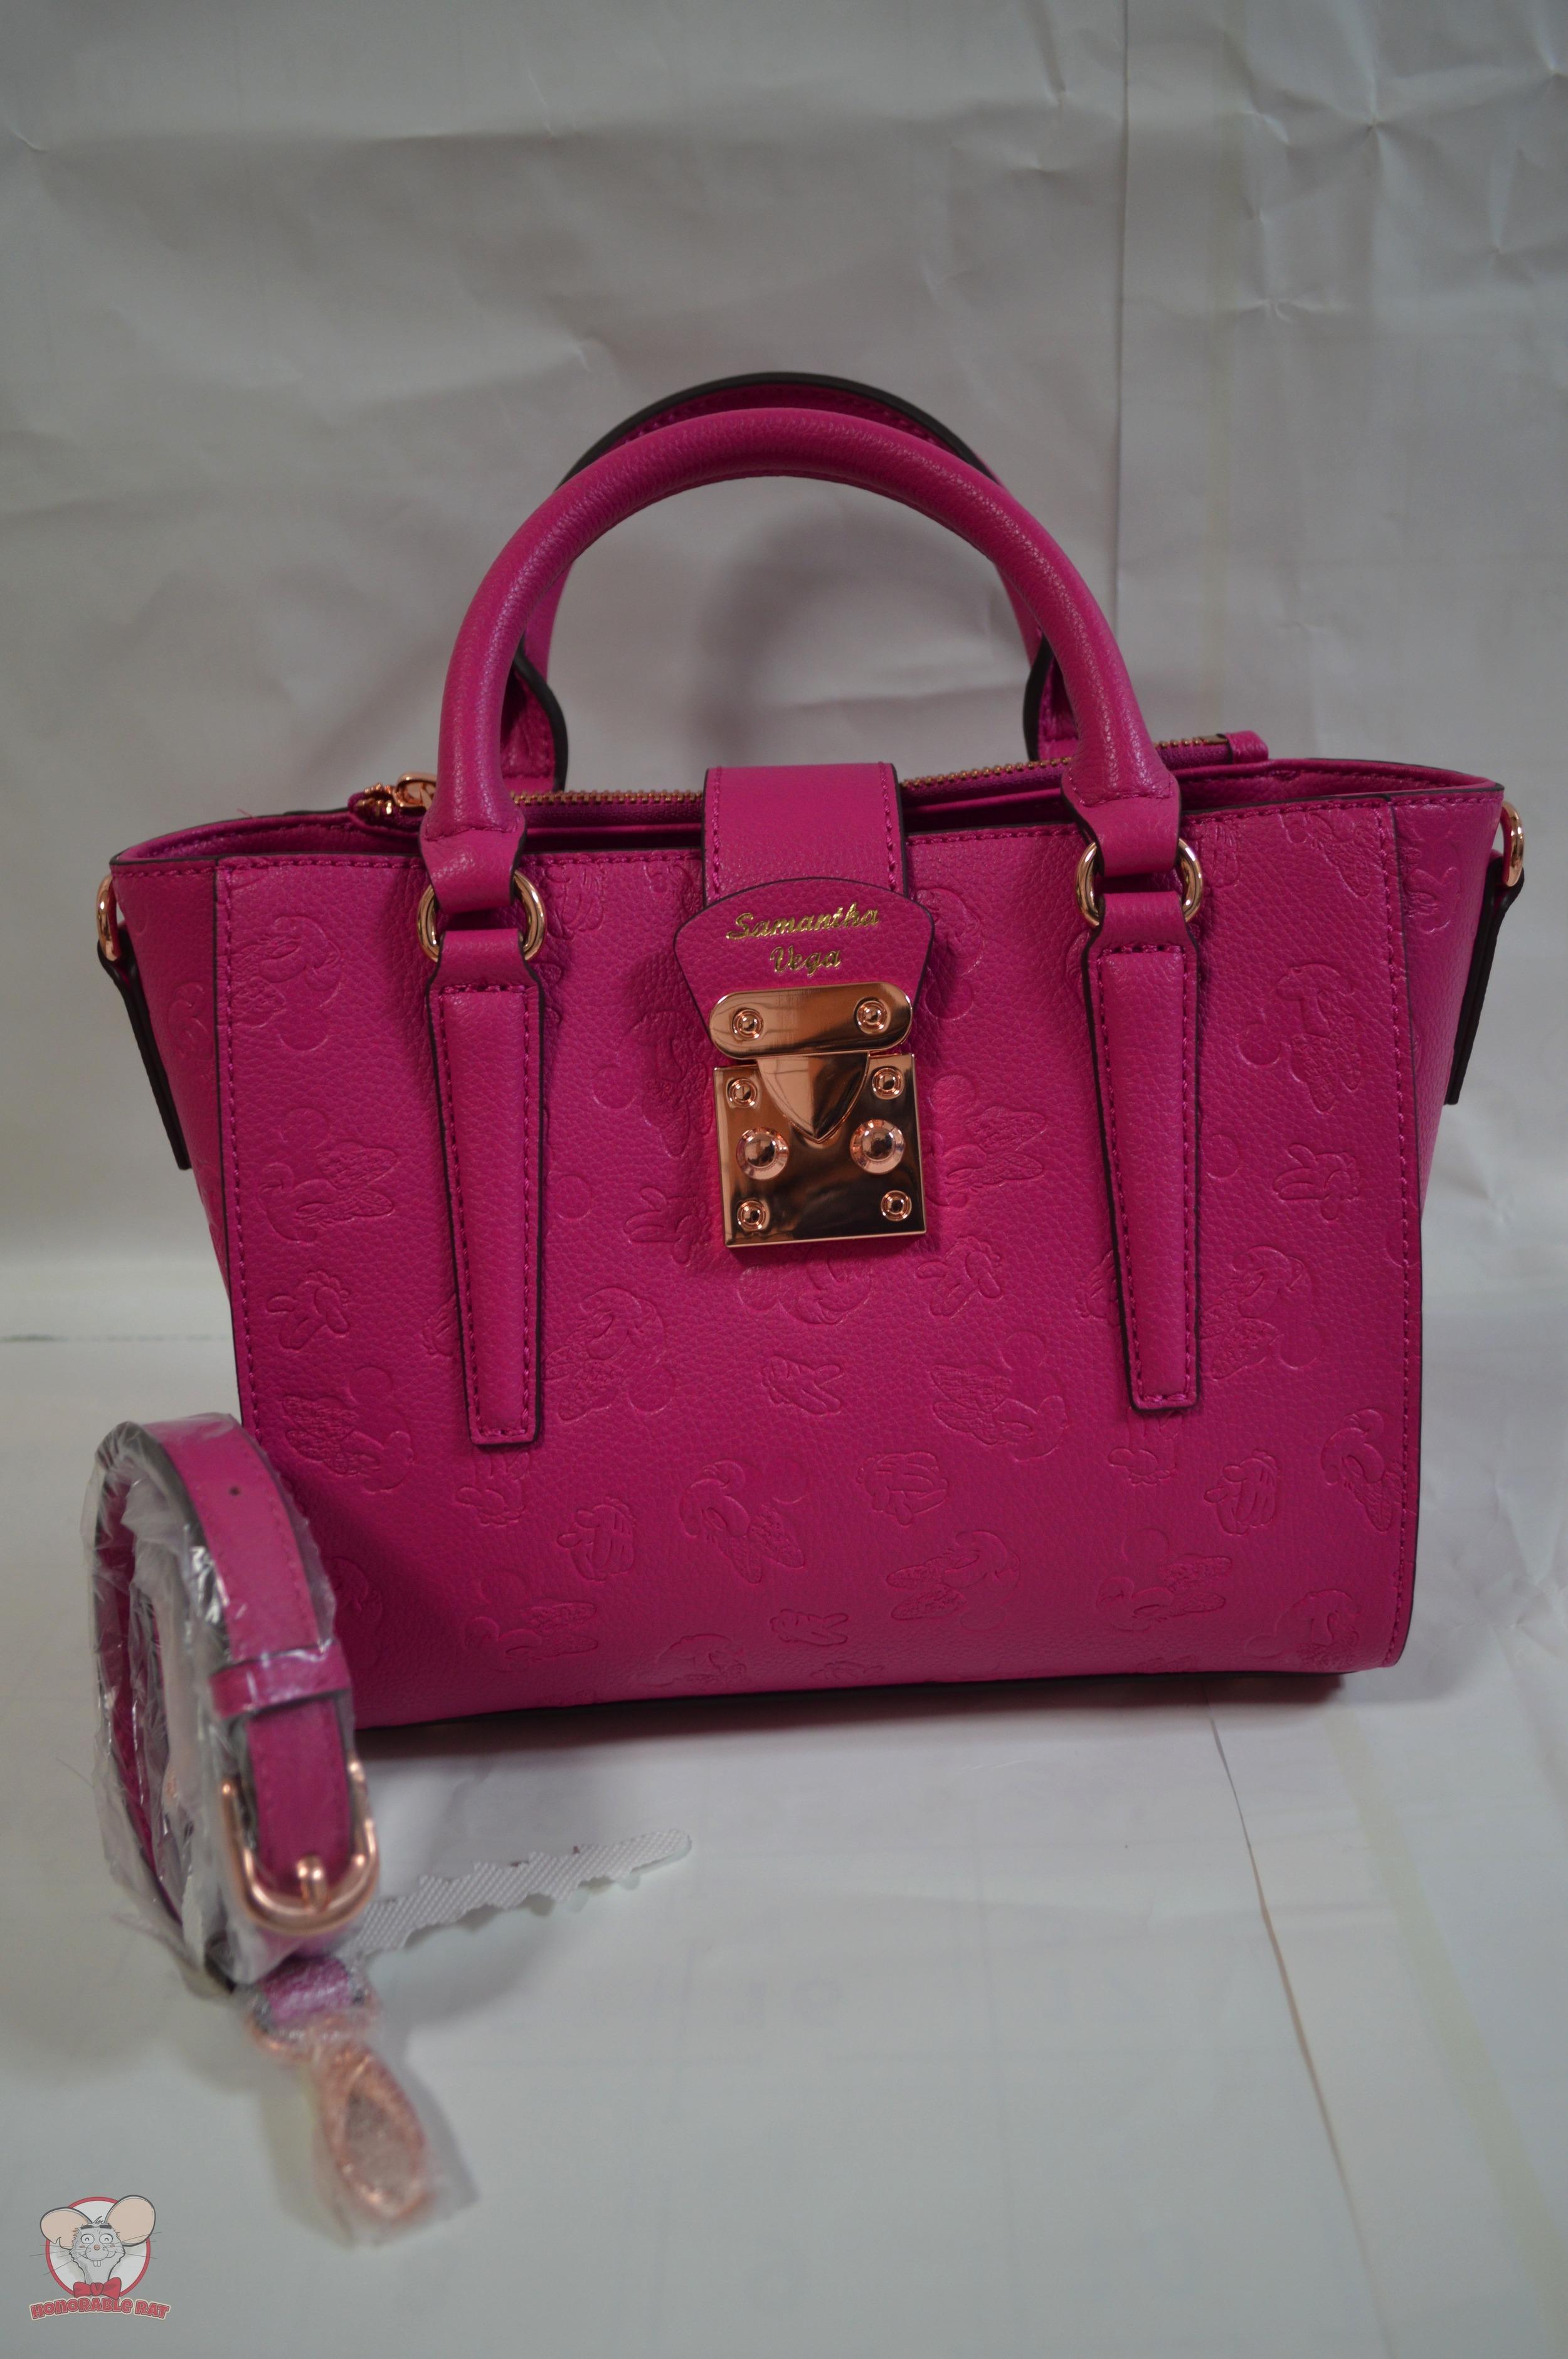 Samantha Vega Bag with Minnie Print